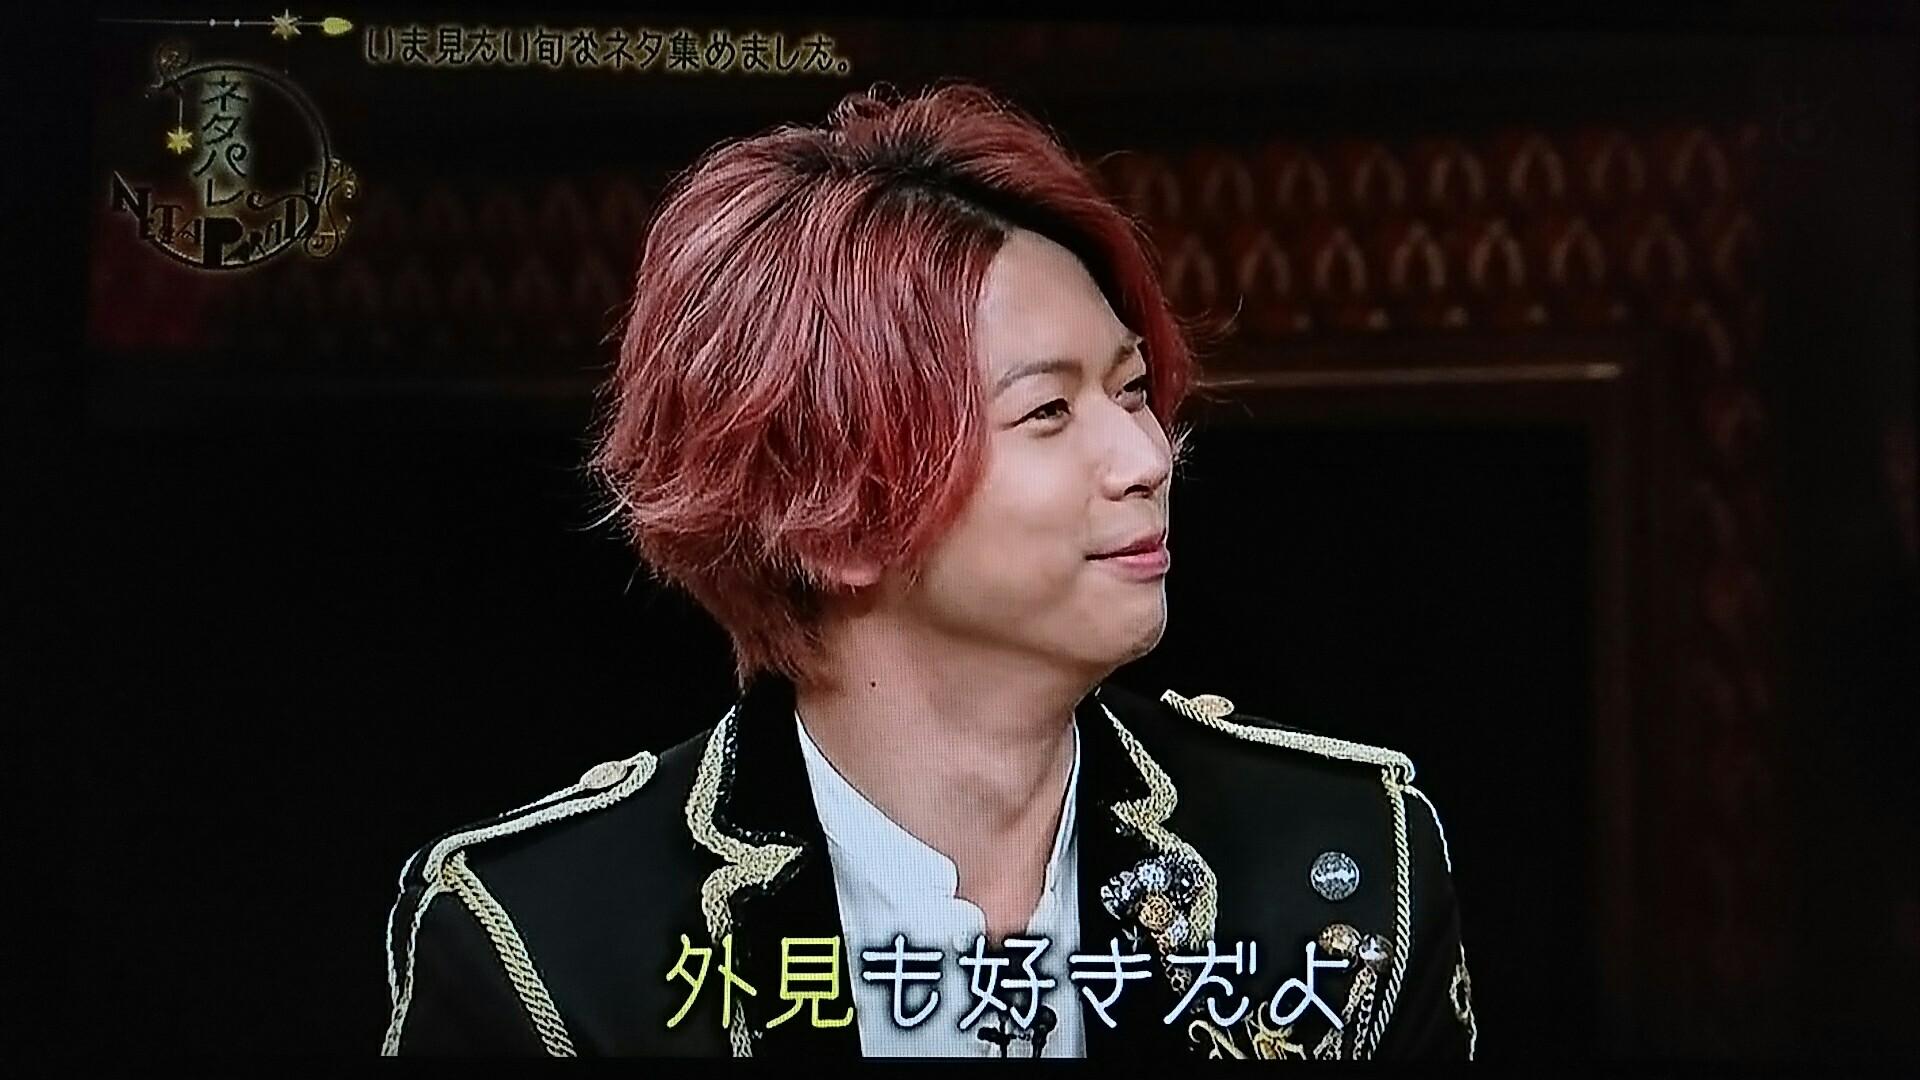 f:id:sunflower-shigeaki:20170606234709j:image